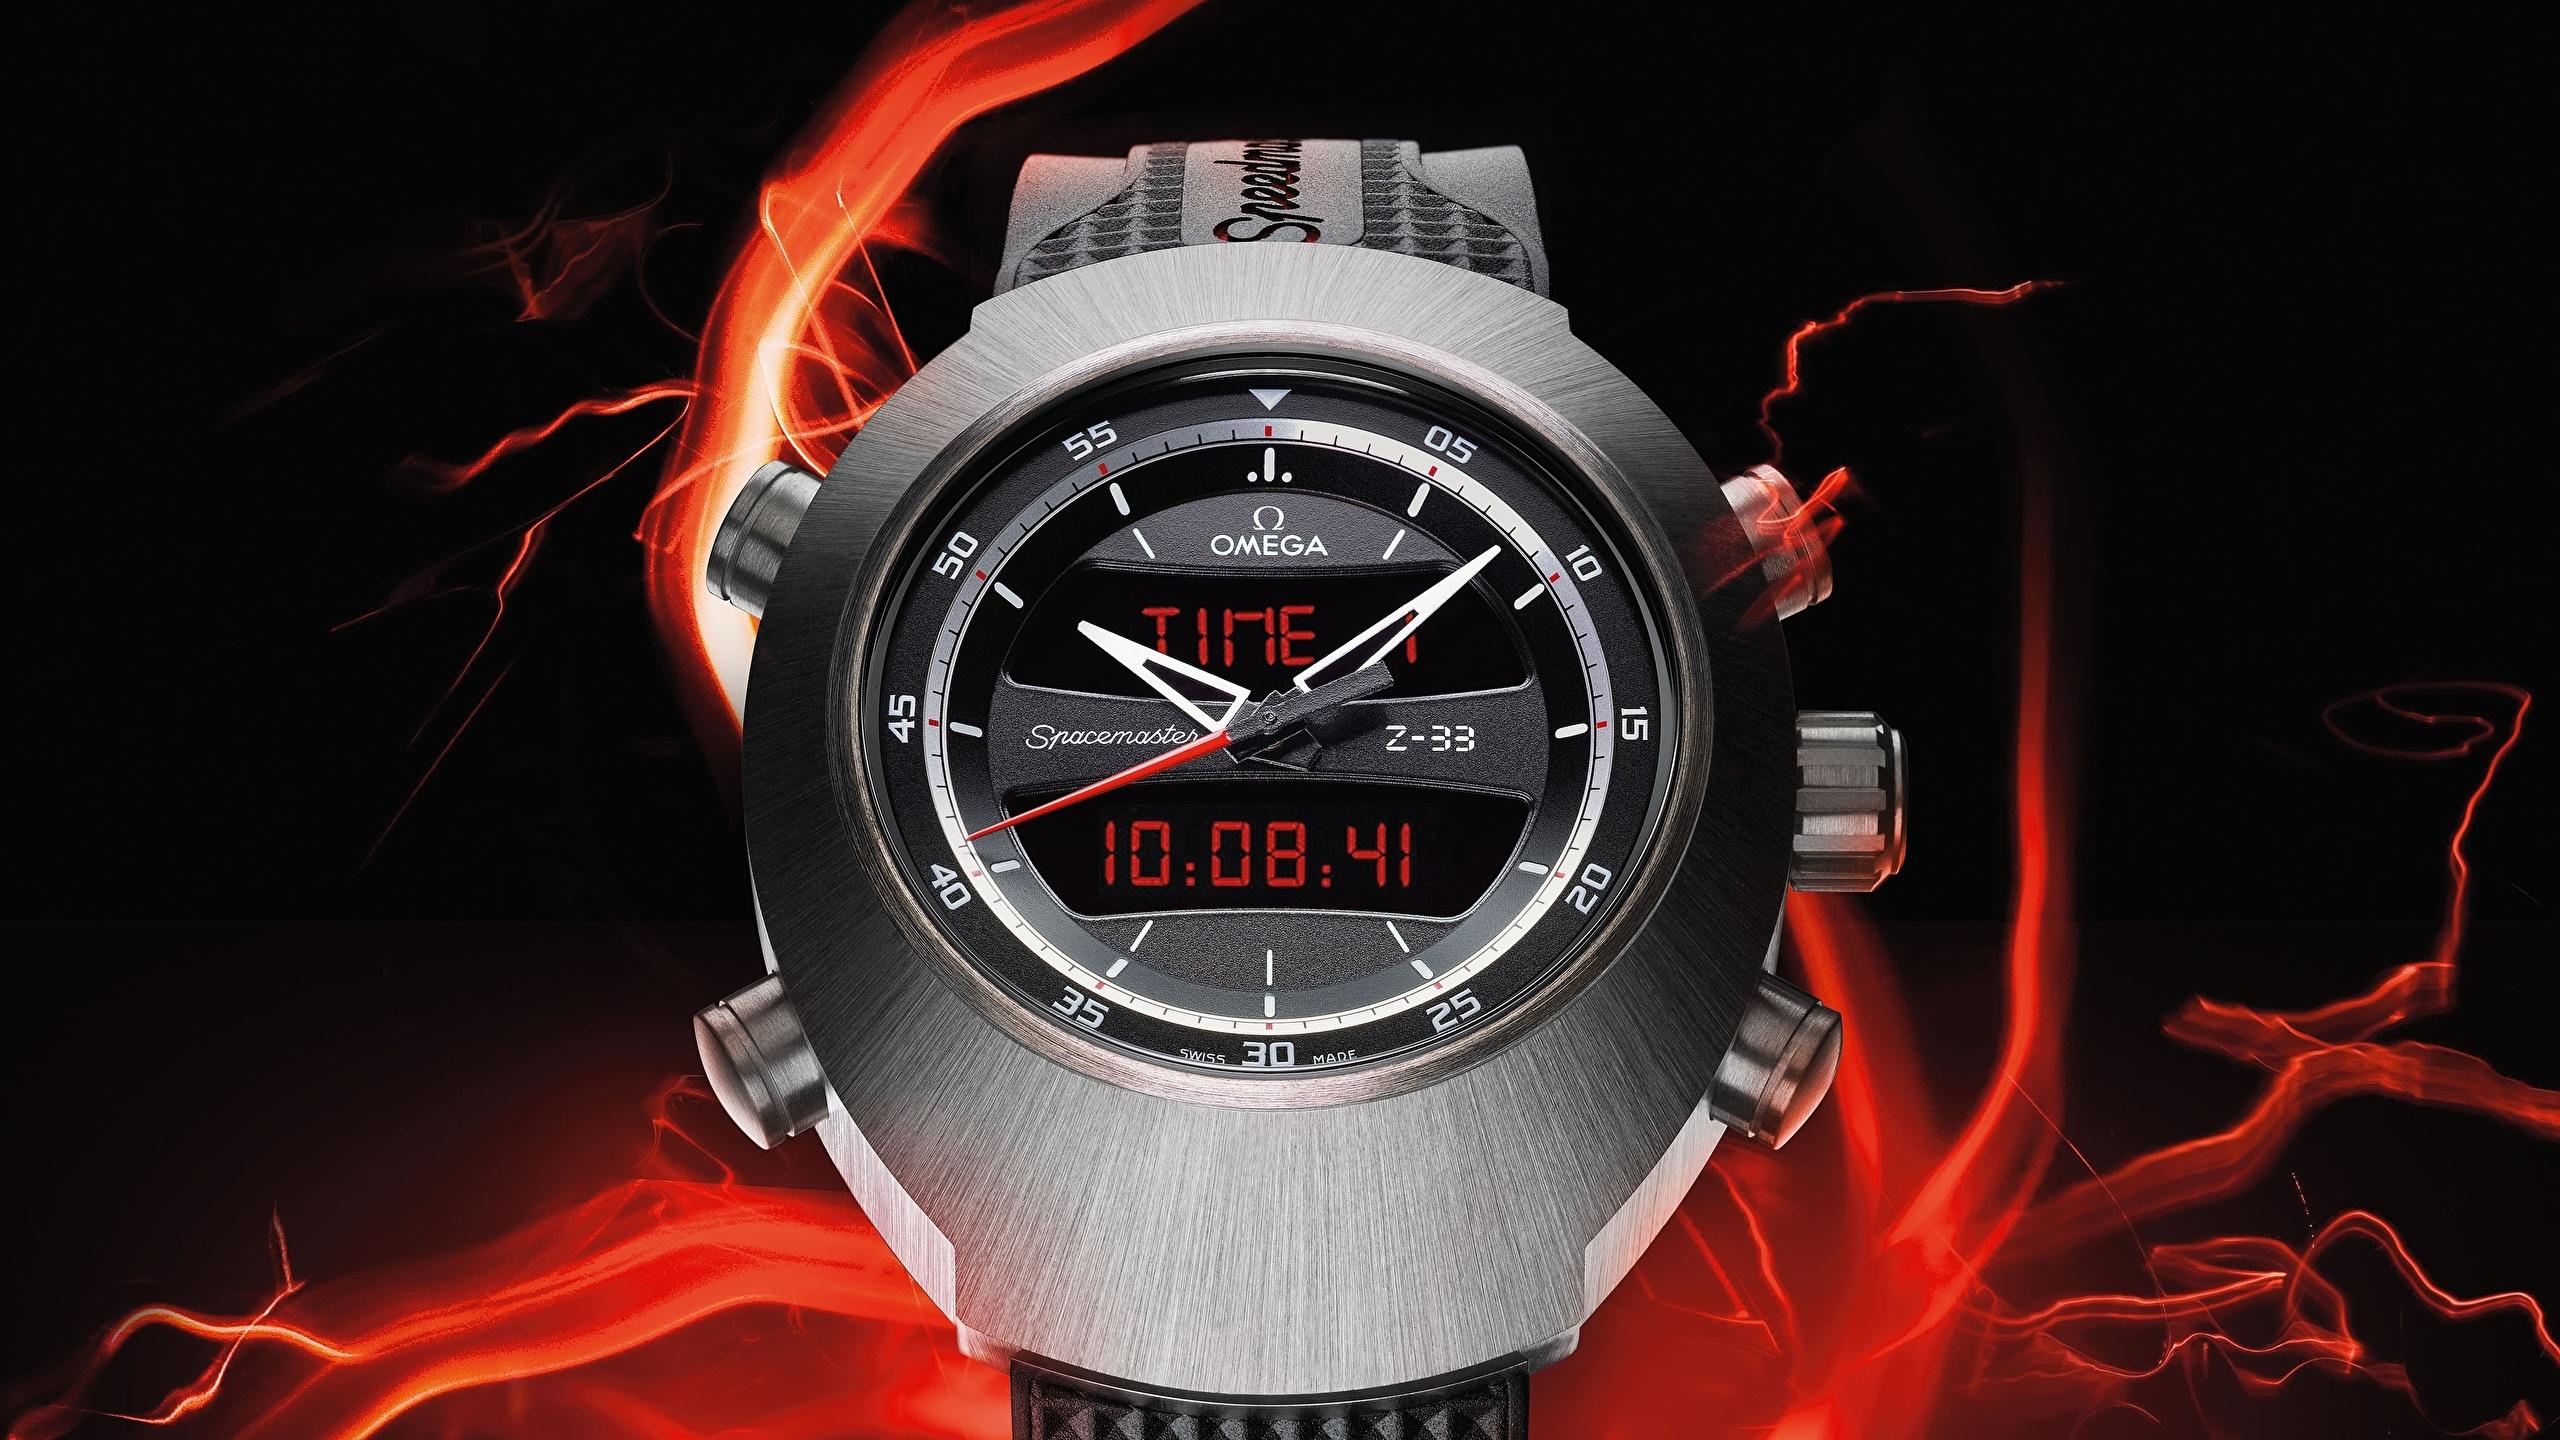 Photo Omega Speedmaster Z 33 Watch Clock Closeup 2560x1440